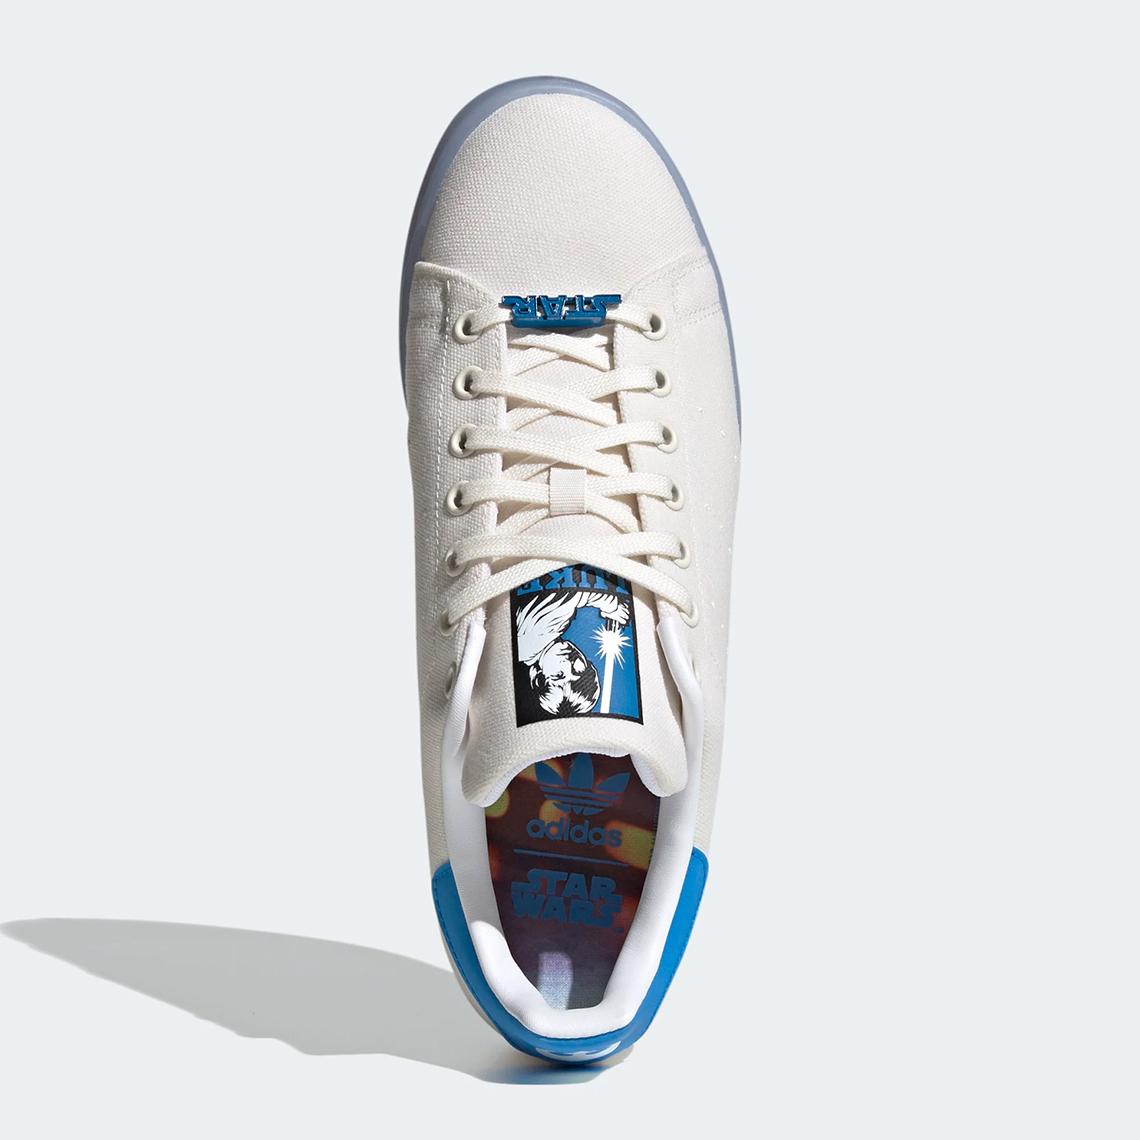 Star Wars x adidas Stan Smith ''Luke Skywalker'' - FX9306